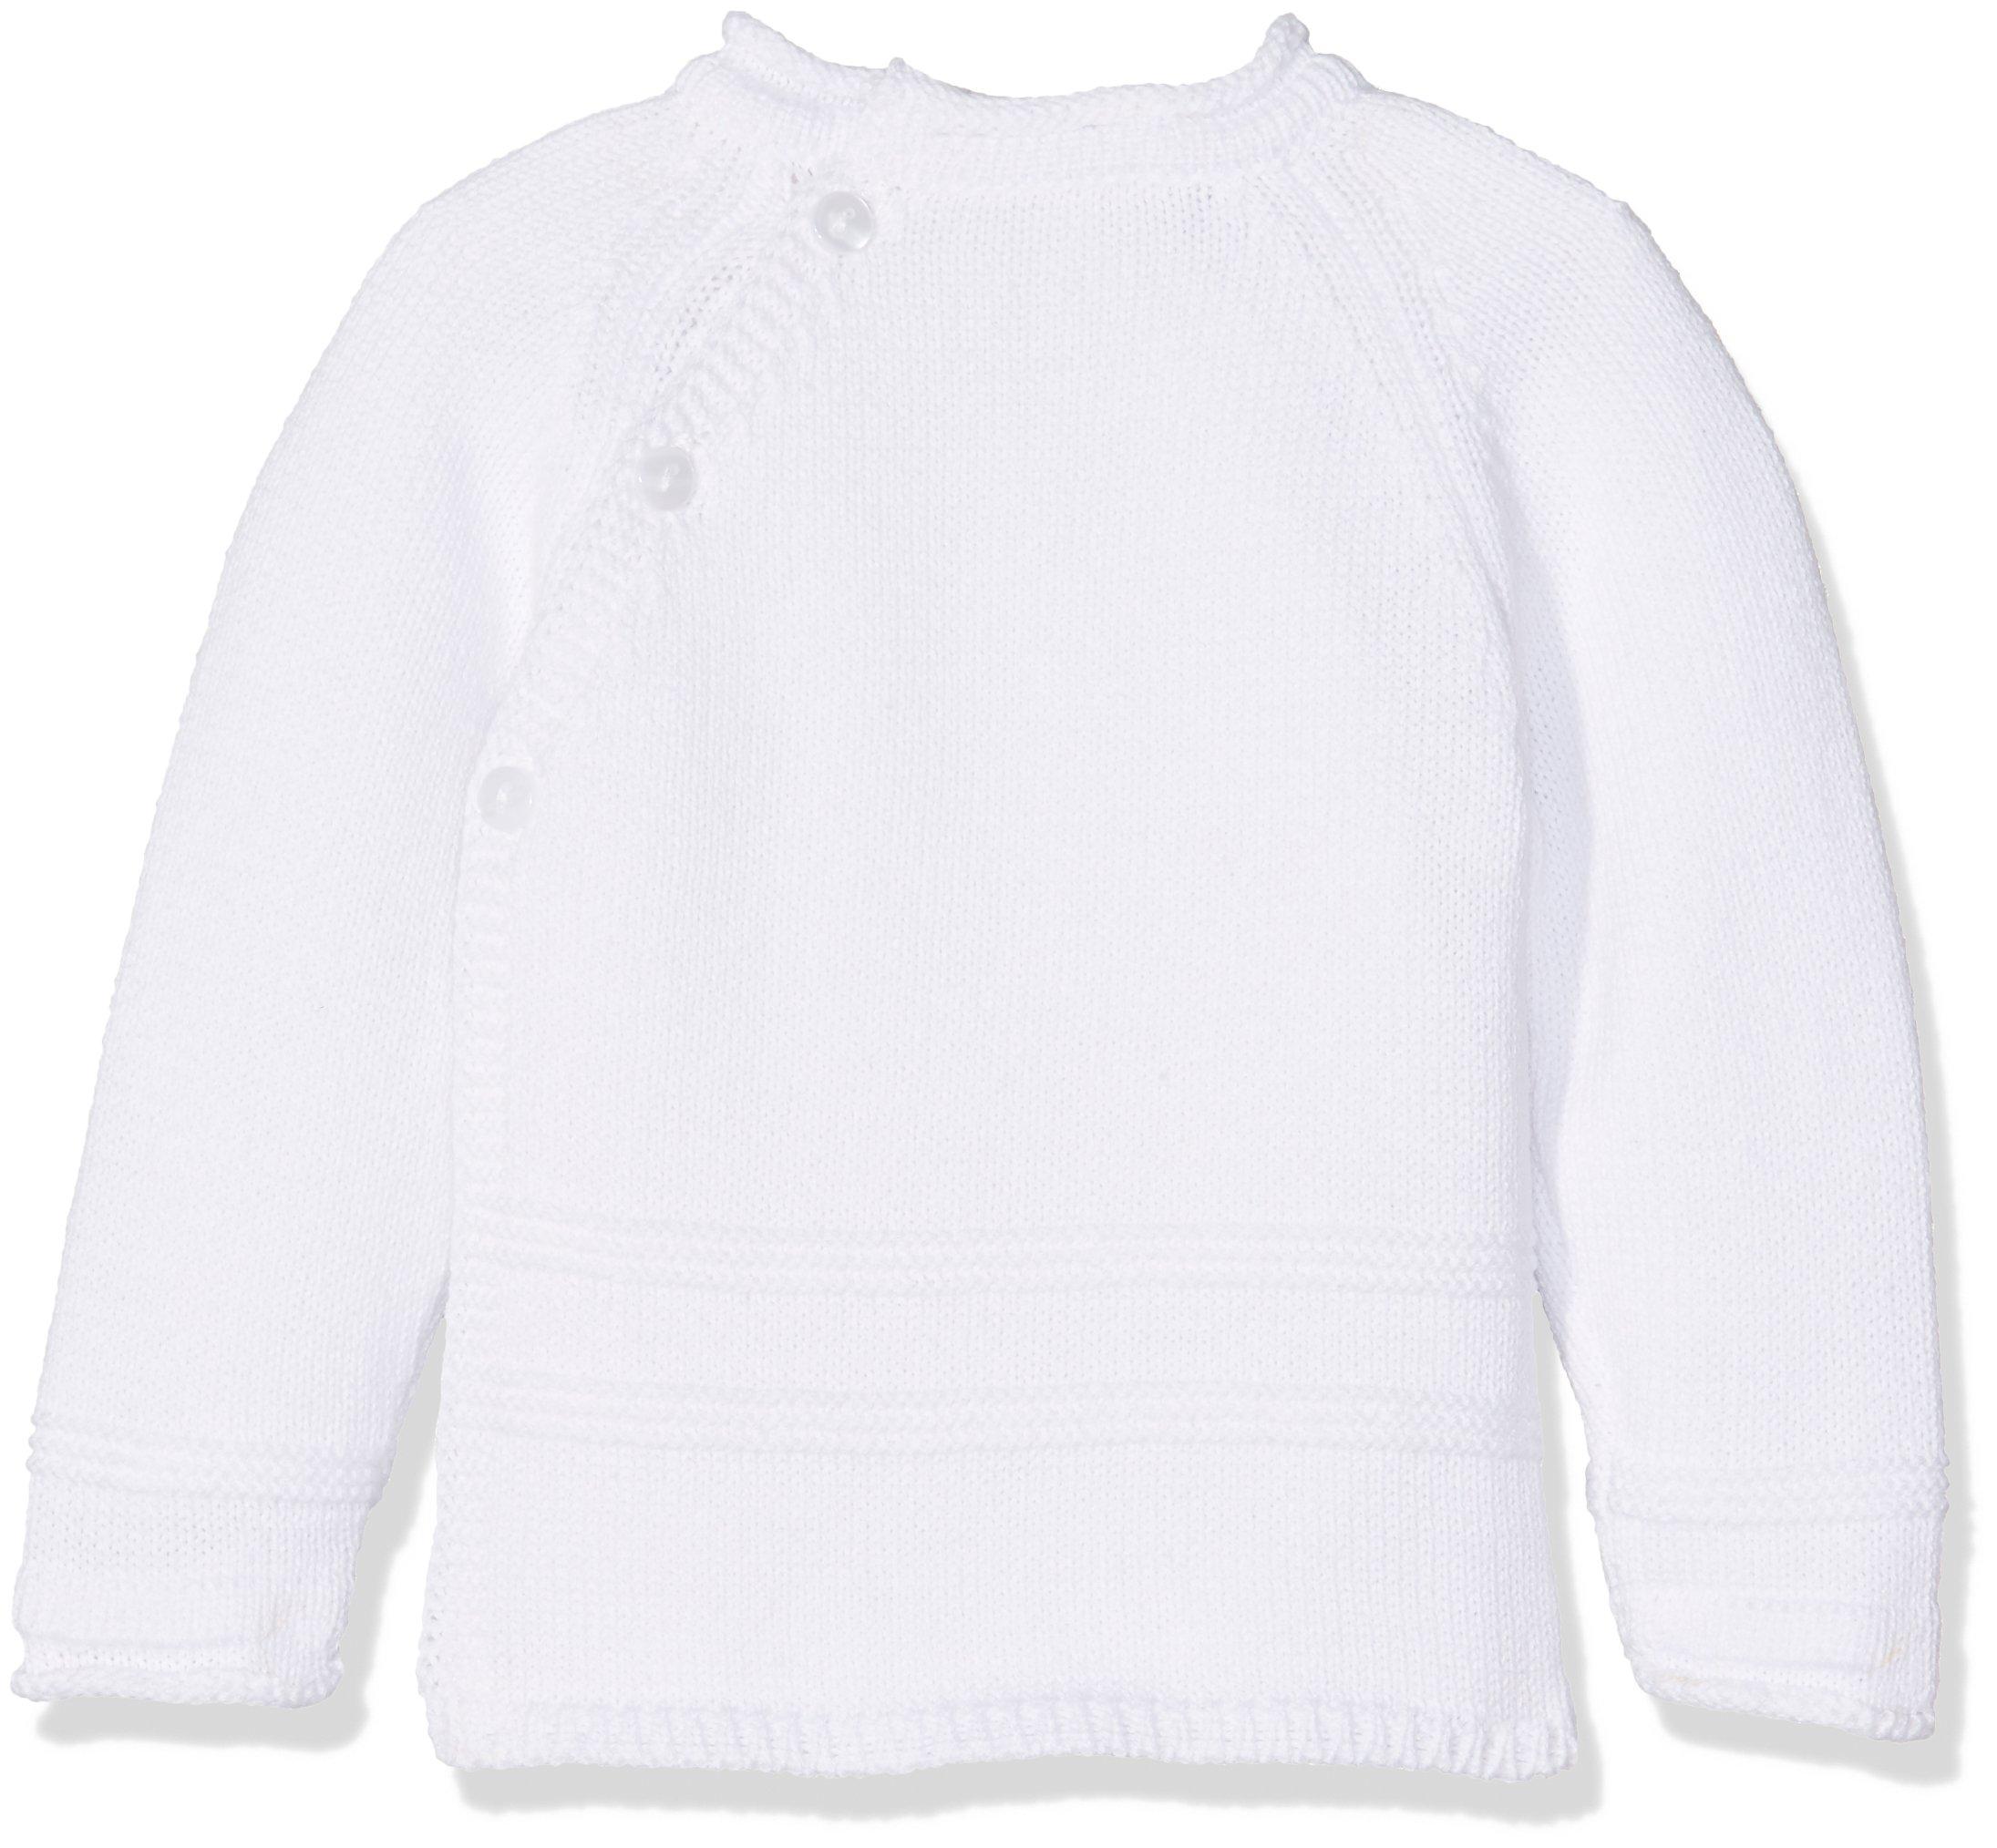 Absorba Boutique PJ Tricots Chaqueta de Punto para Bebés